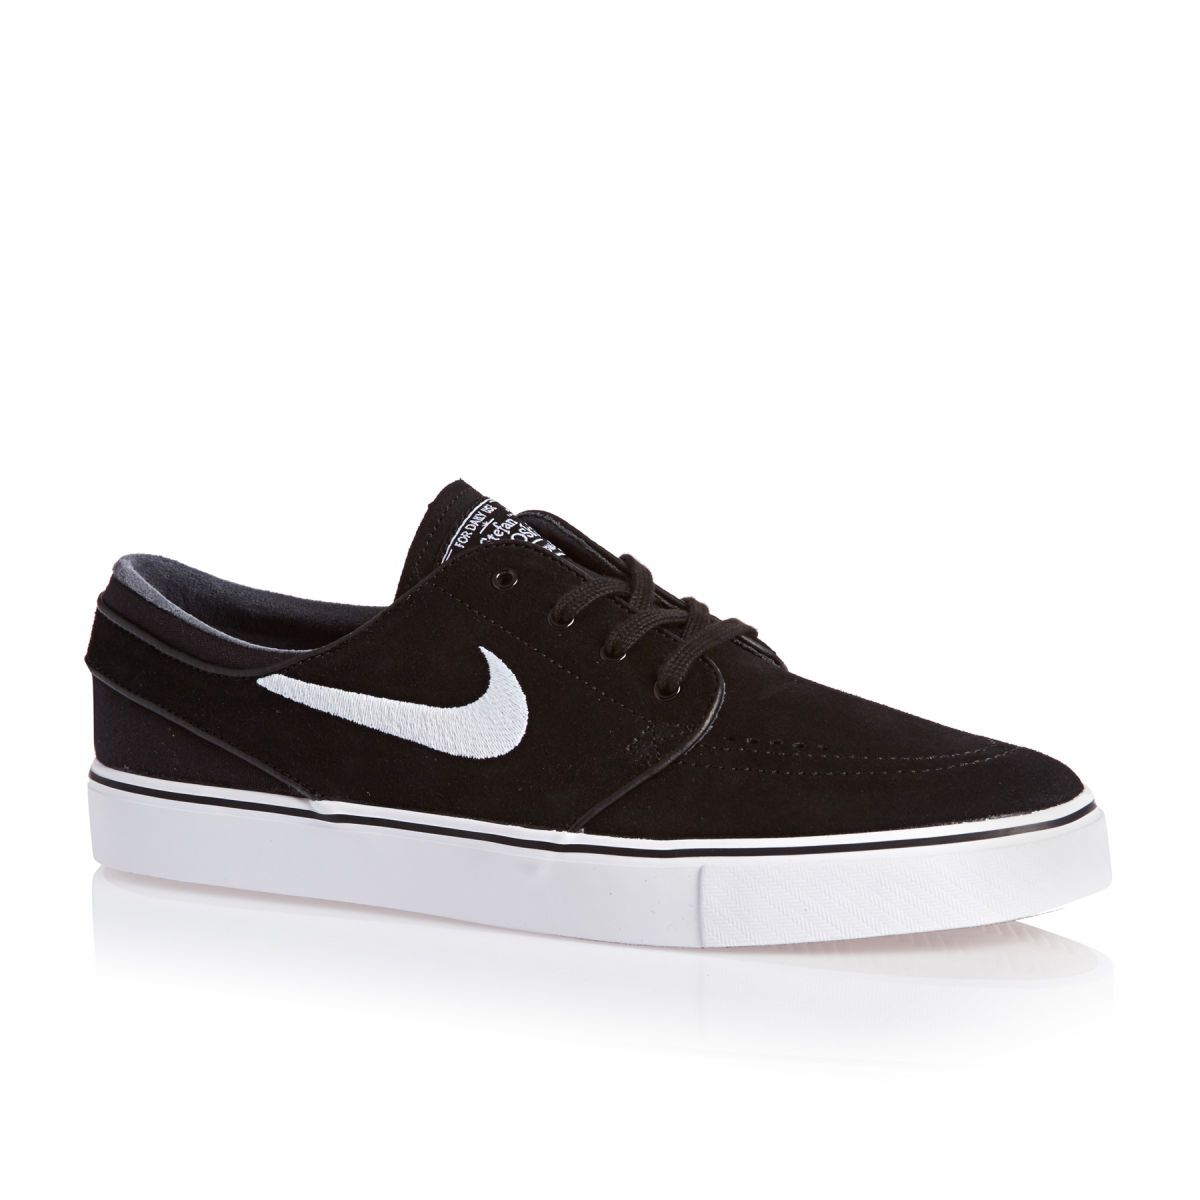 Black · £59.99 - Nike Skateboarding Zoom Stefan Janoski Trainers - Black/ white